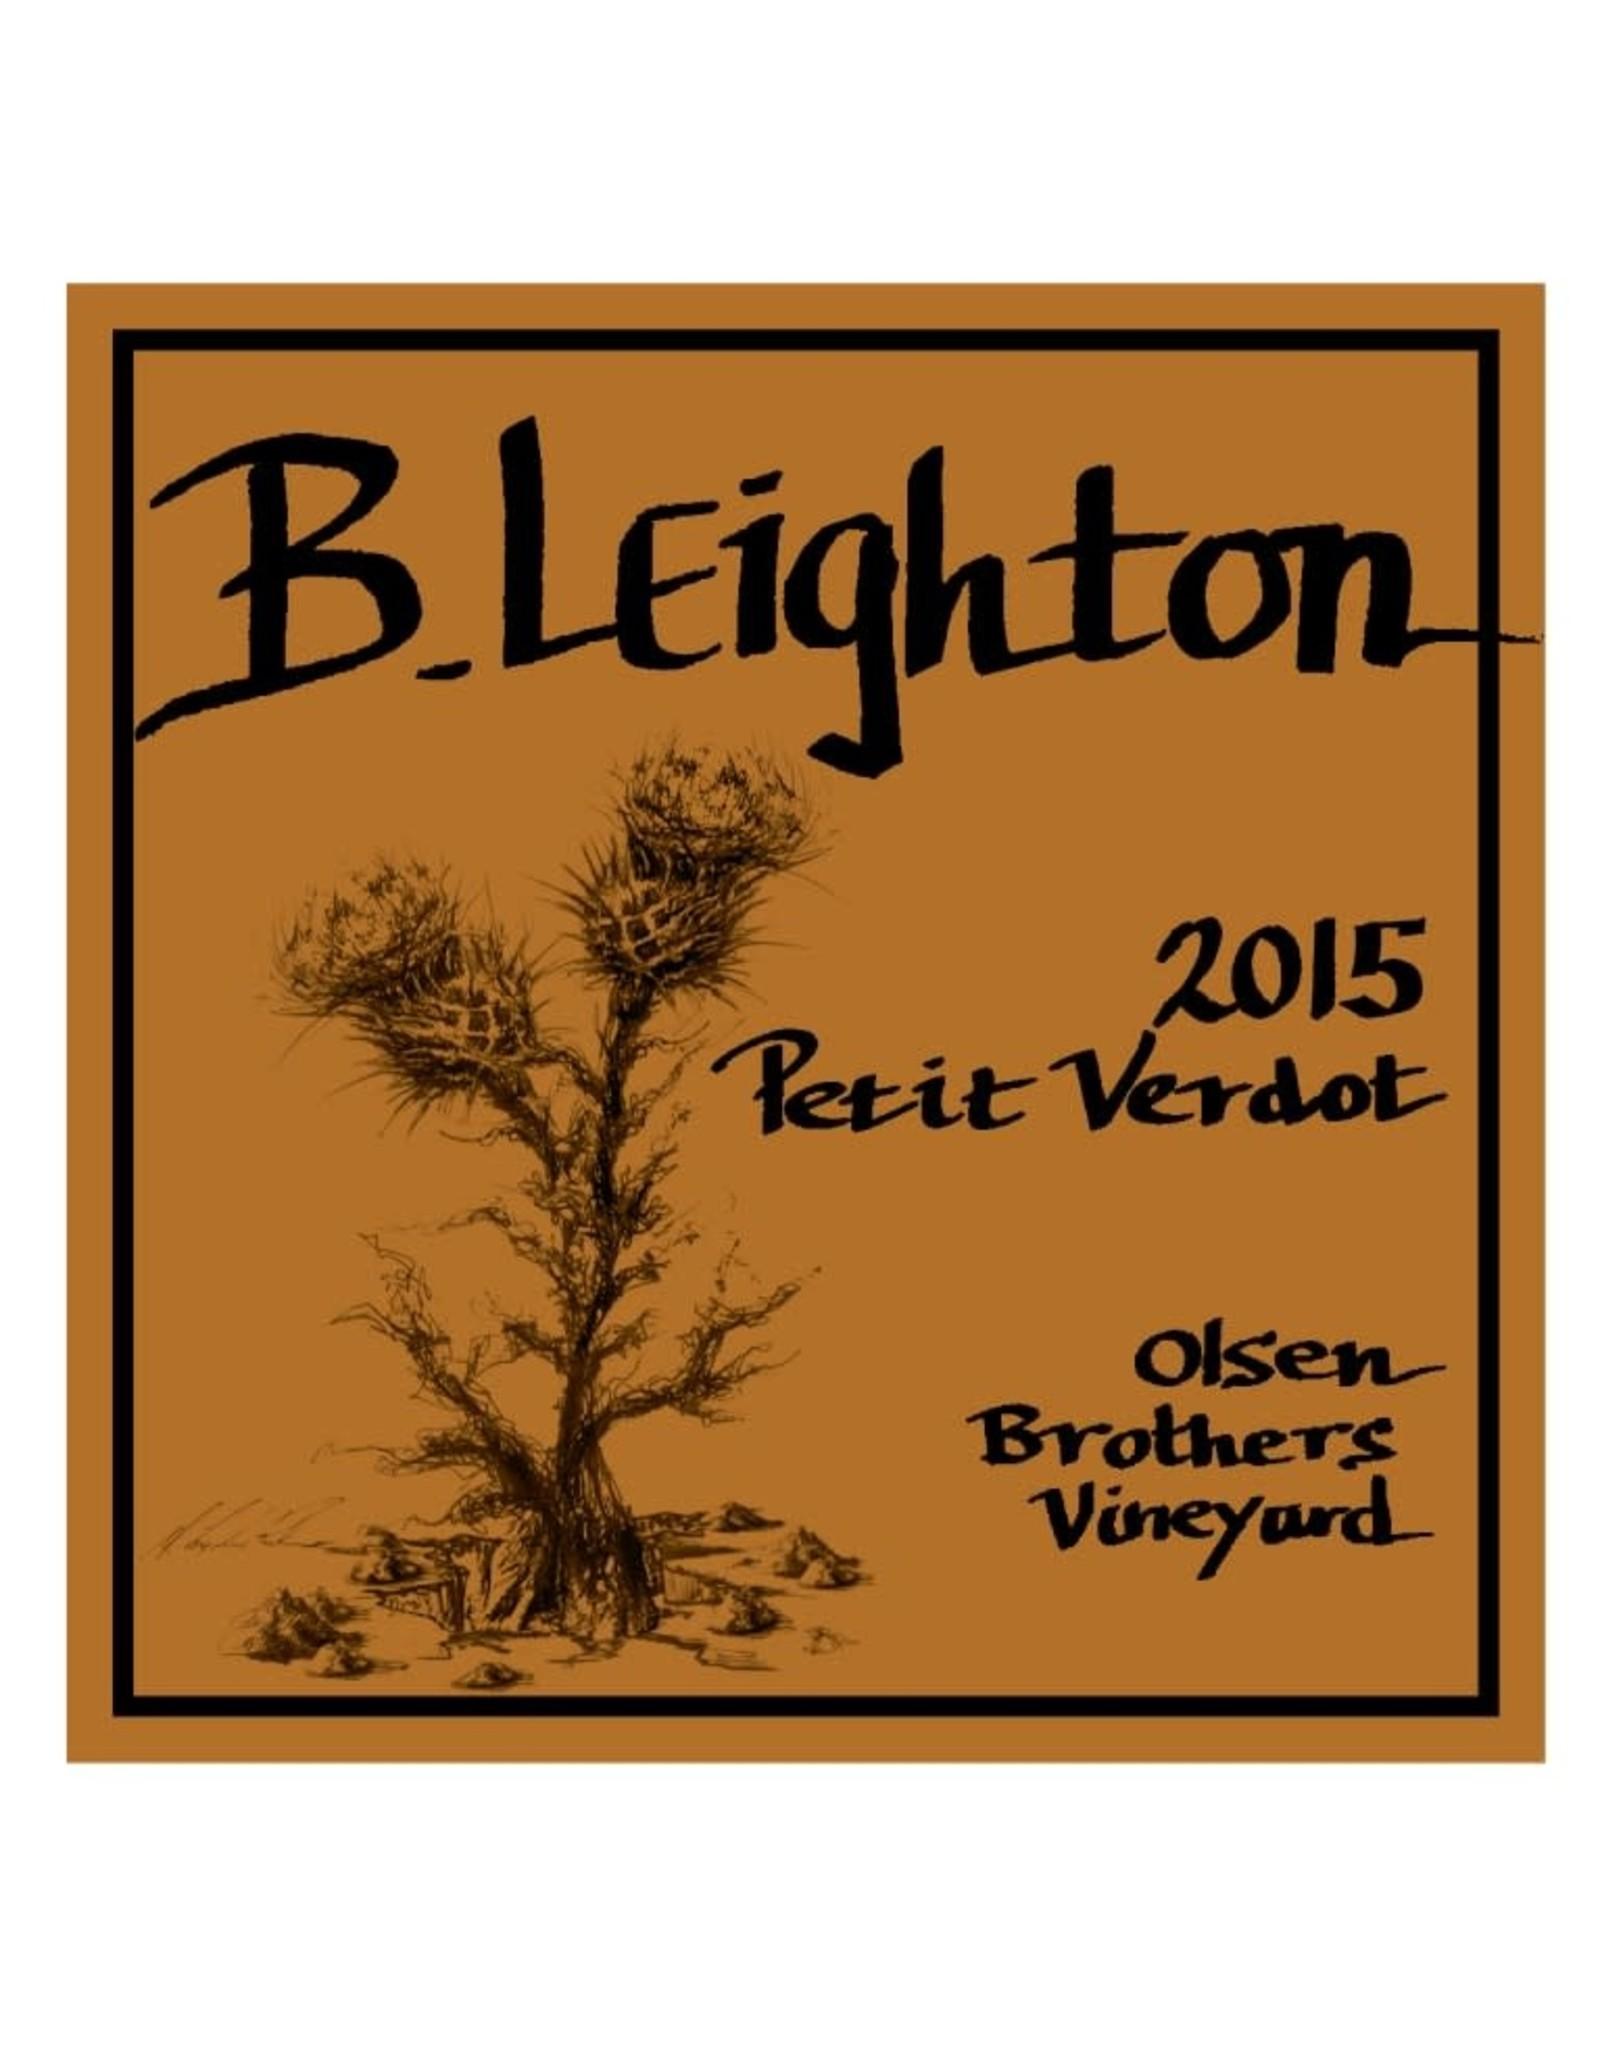 B Leighton Petit Verdot 2015